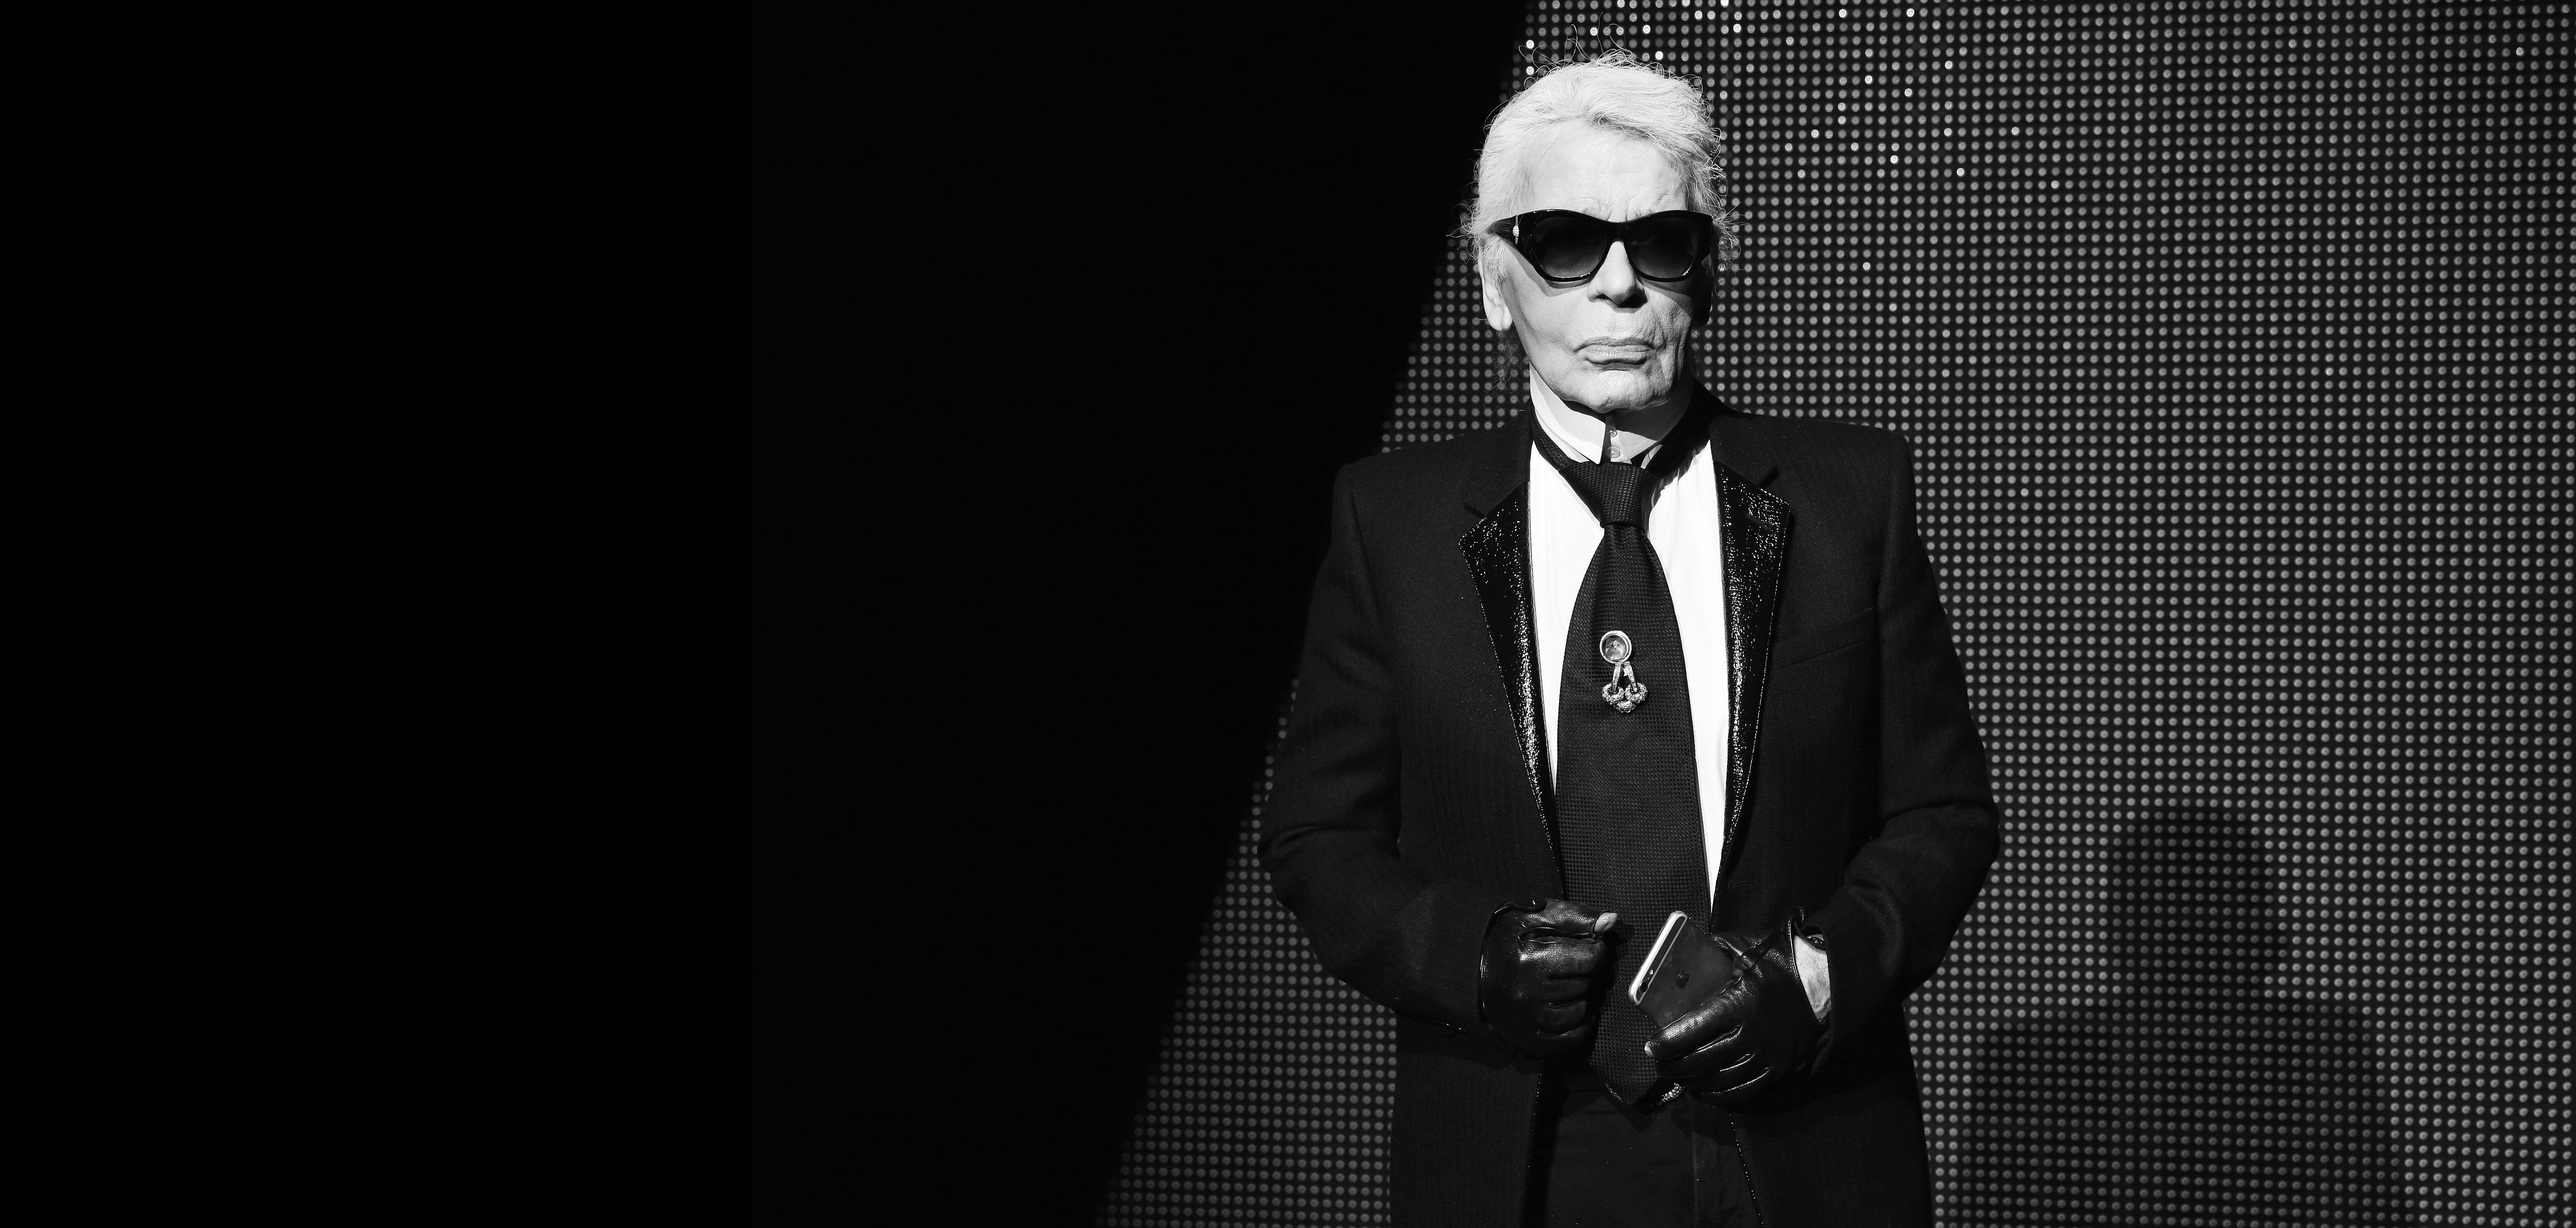 FLA Fashion Icon Karl Lagerfeld on Fashion, Art, and L.A ...